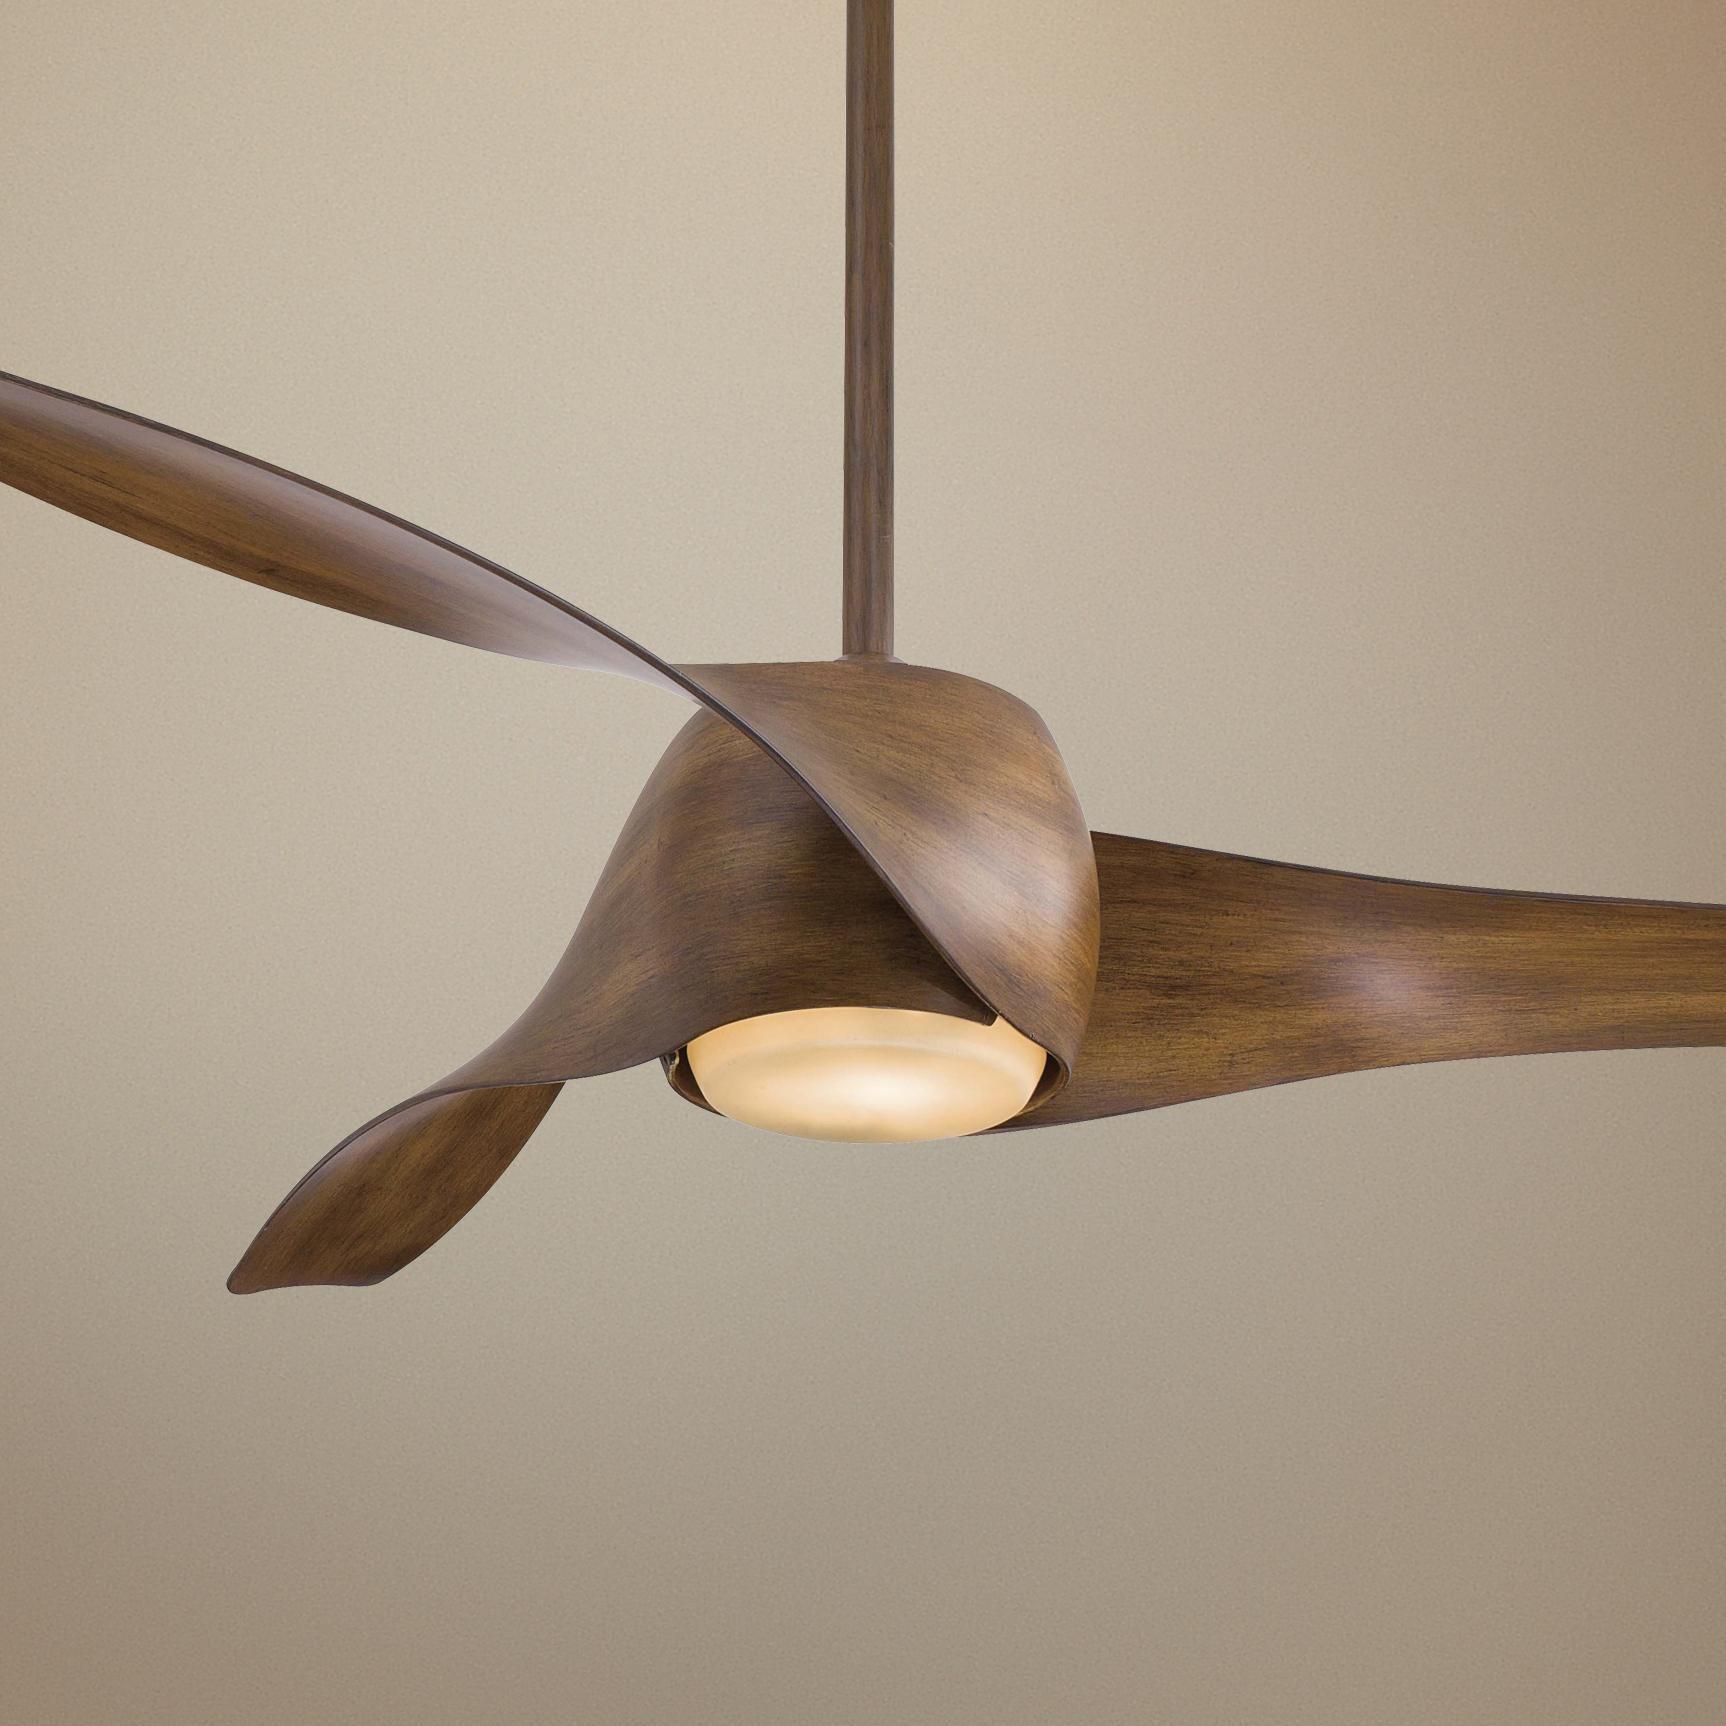 "$549 58"" Artemis Distressed Koa Finish Ceiling Fan"